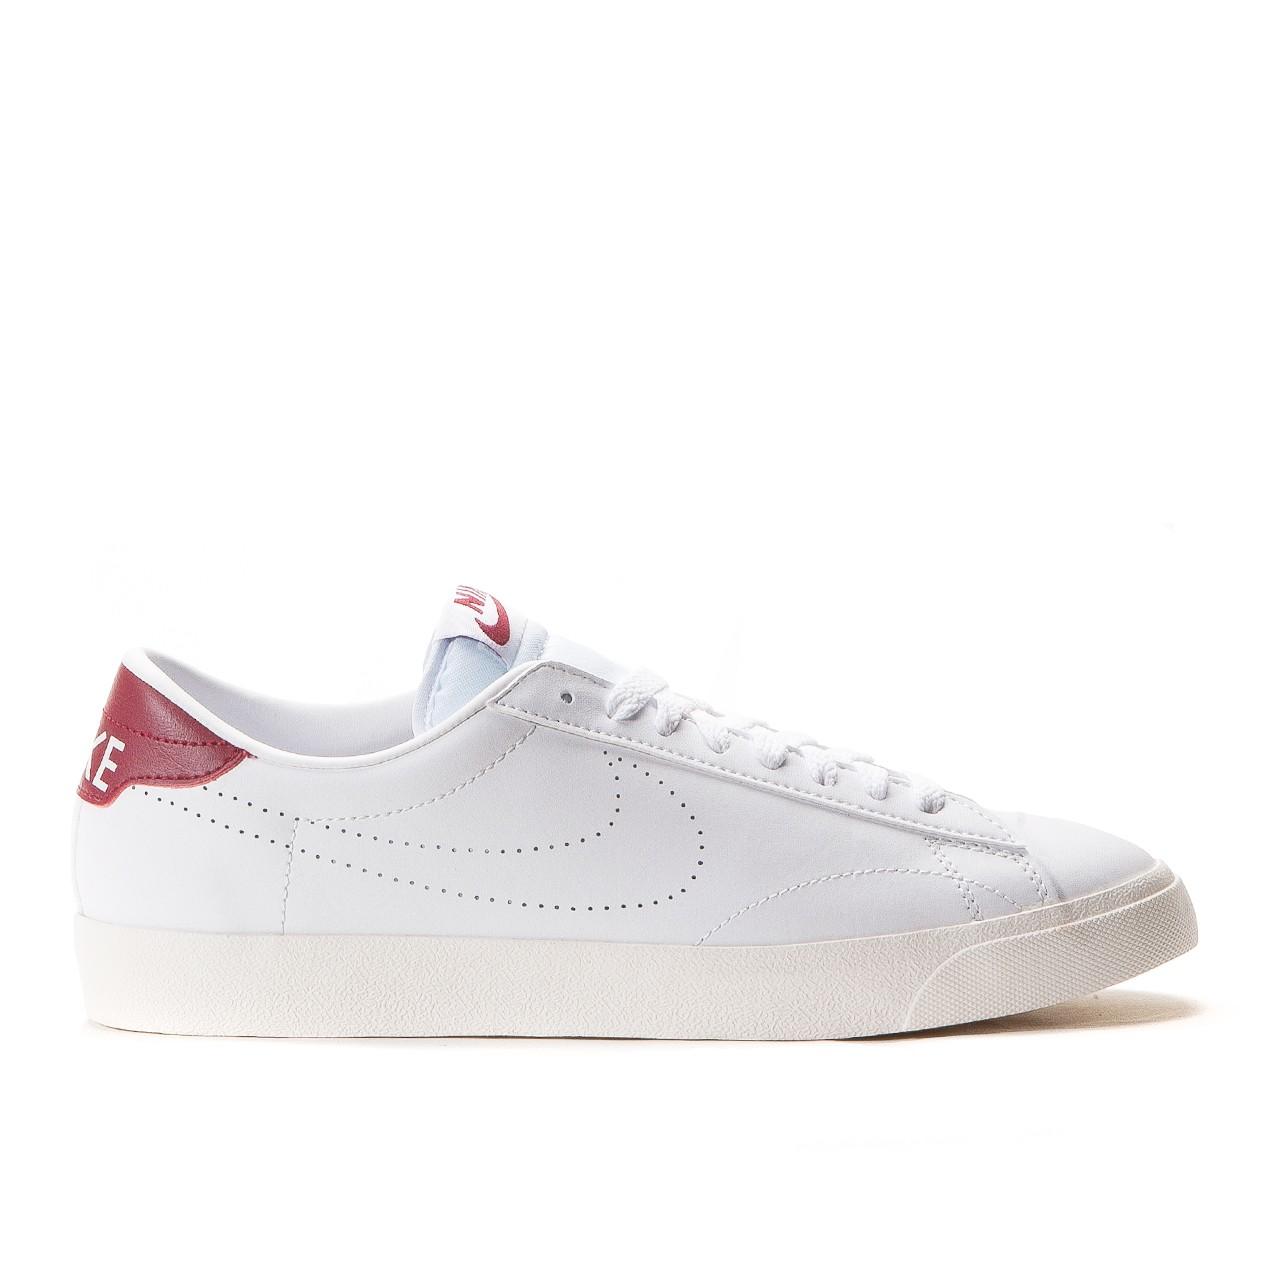 lowest price 1af77 2b1b3 Nike Tennis Classic AC (White Chianti)